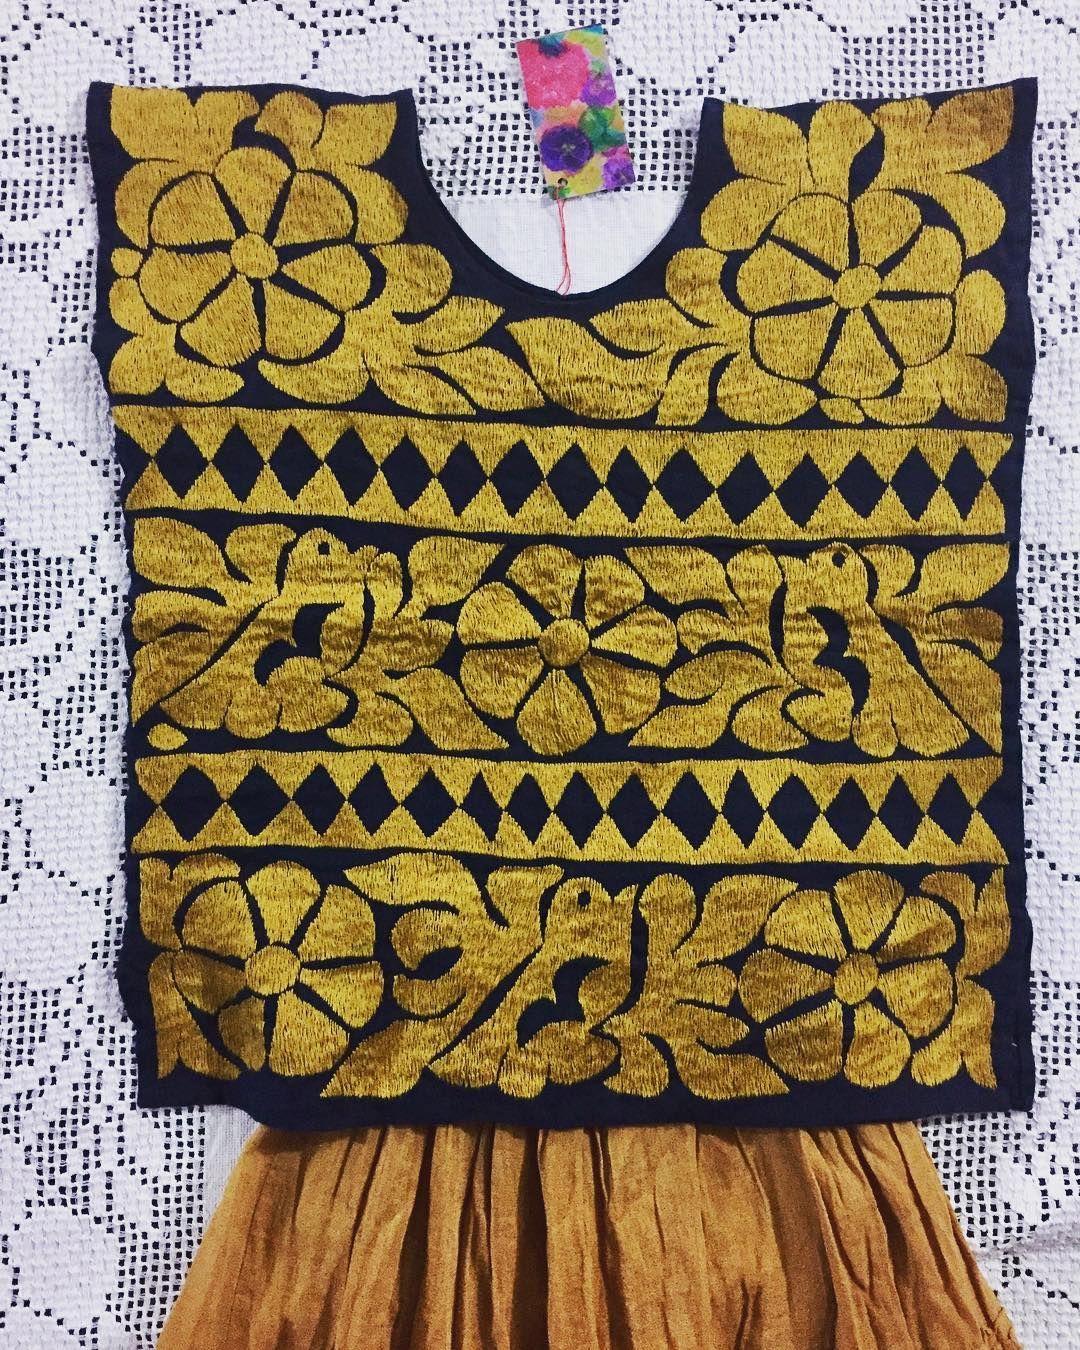 Jalapa de Díaz  pensamientosoclaveles  bordadoamano  mexicanembroidery   consumelocal  handmade Blusa Bordada A d4120c8b8f3dd